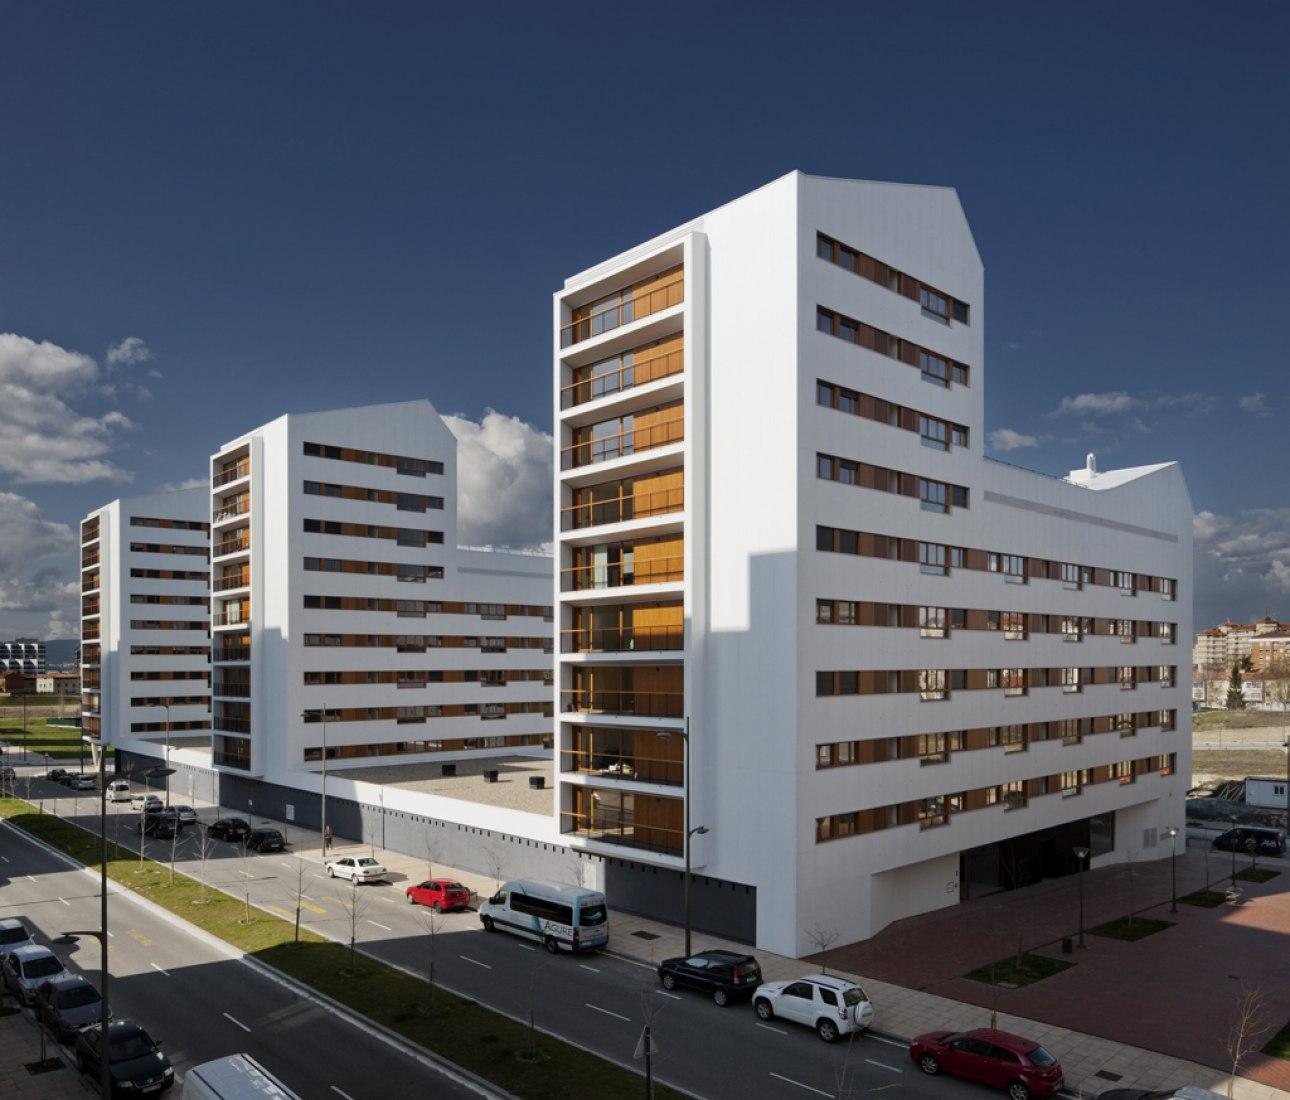 104 Social Housing Units in Borinbizkarra. Photography © Aitor Ortiz. Courtesy of ACXT.